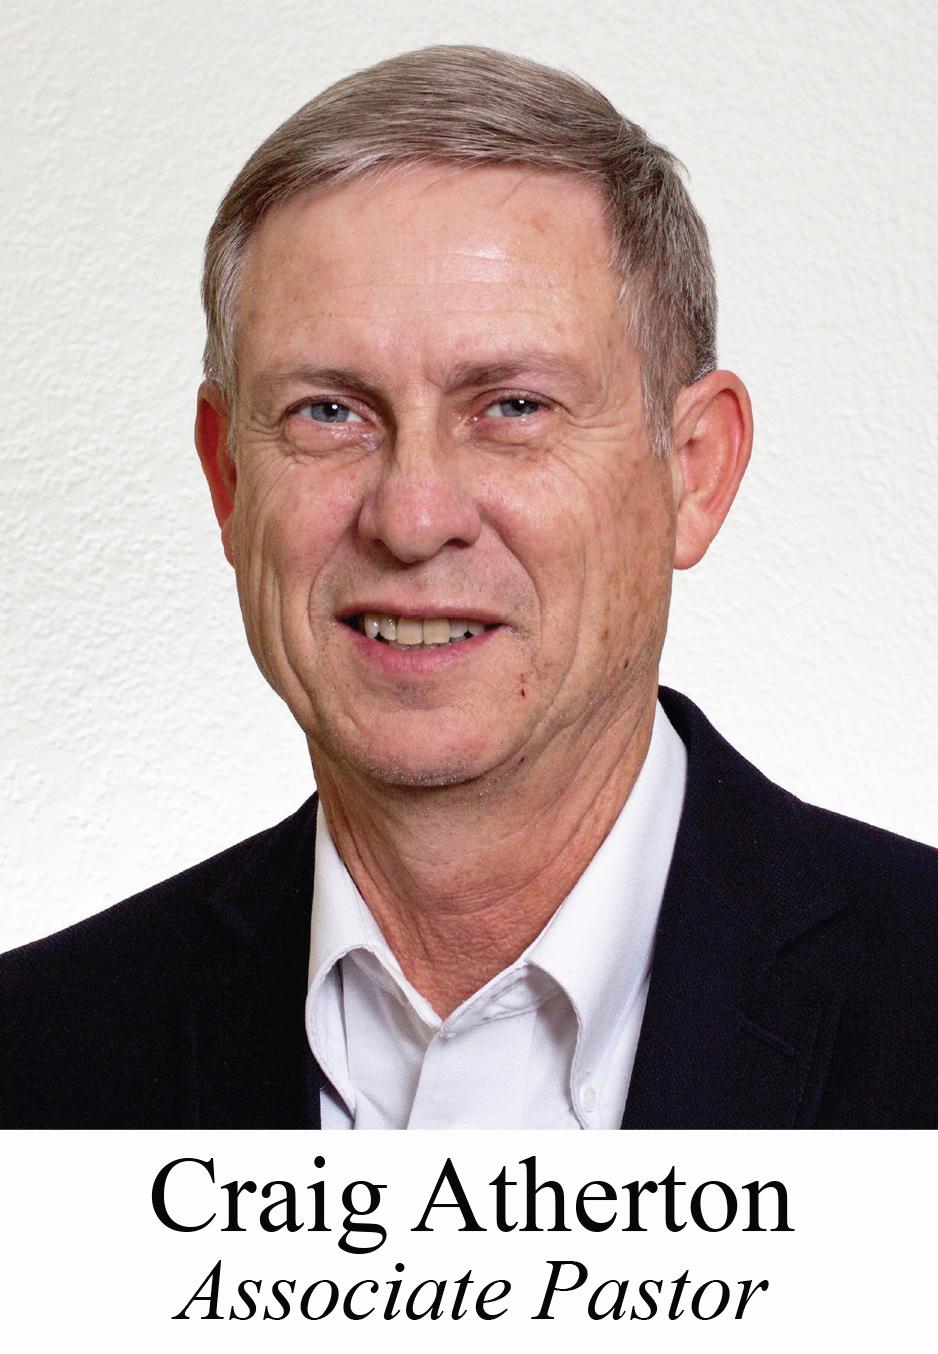 Craig Atherton - AssociatePastor.jpg